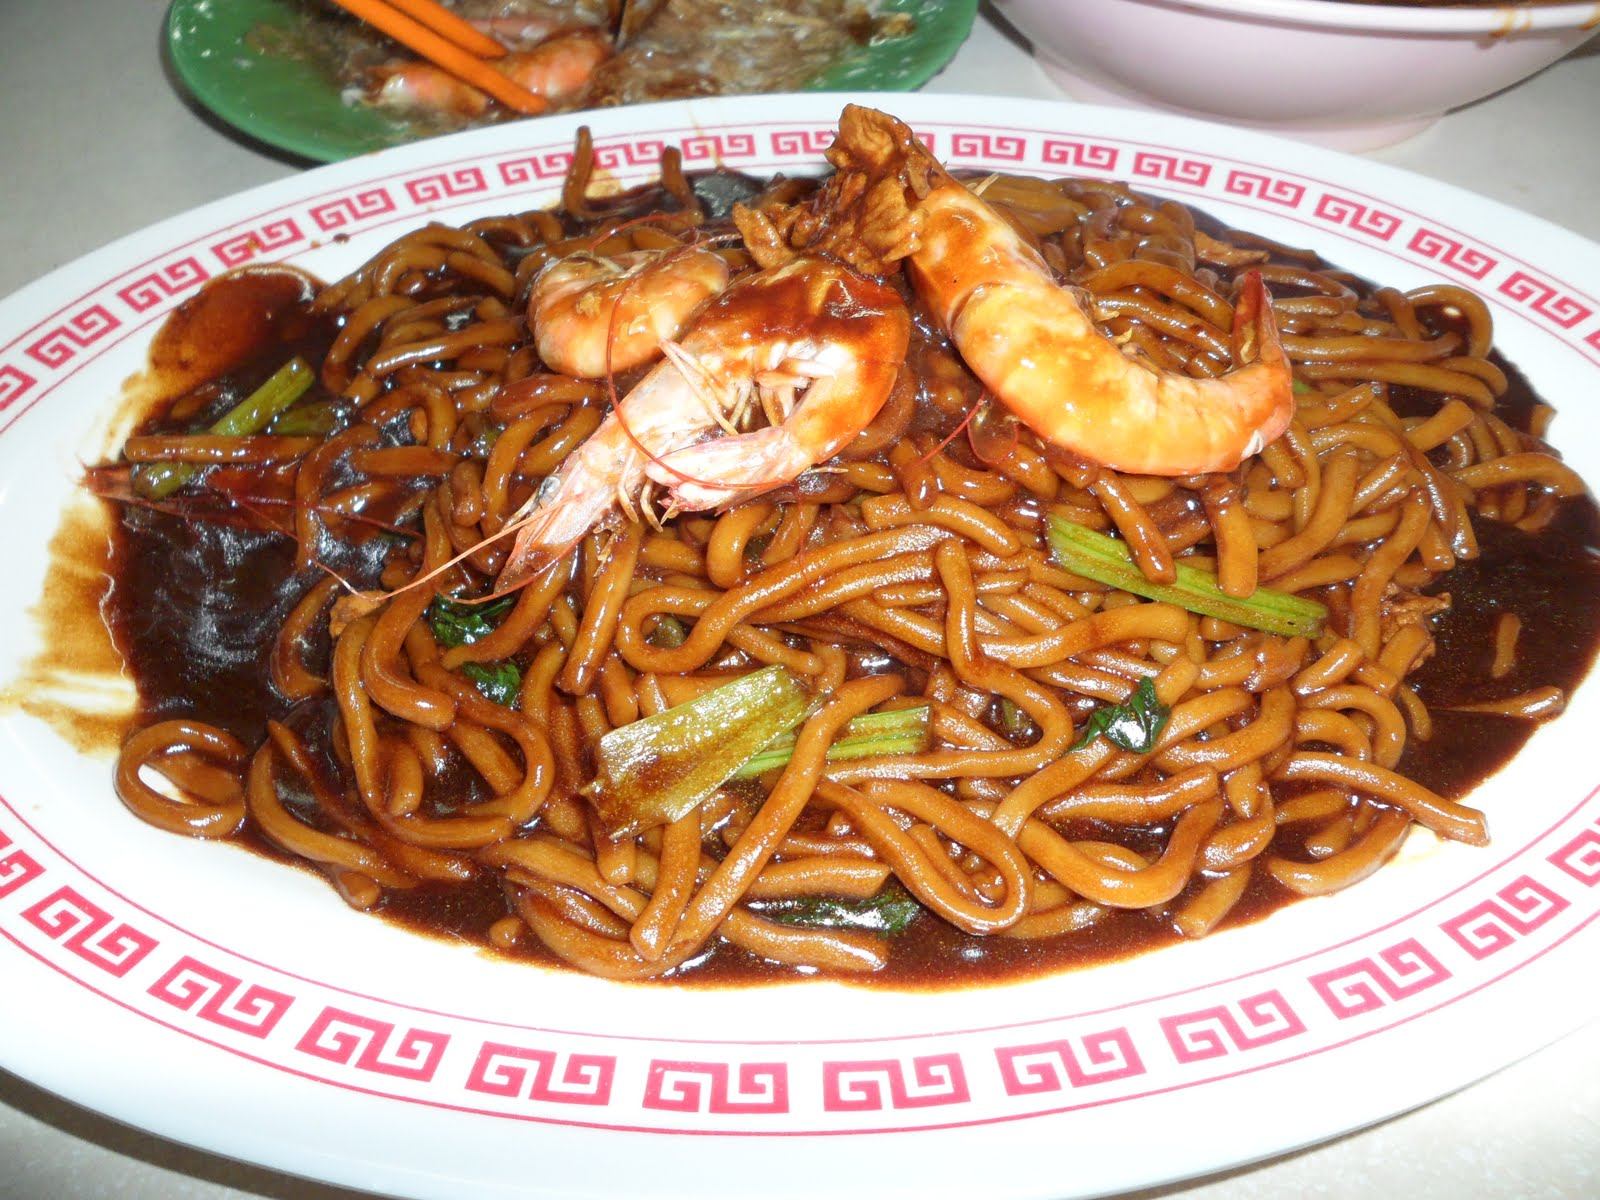 We live to eat: KL Style Black Hokkien Mee